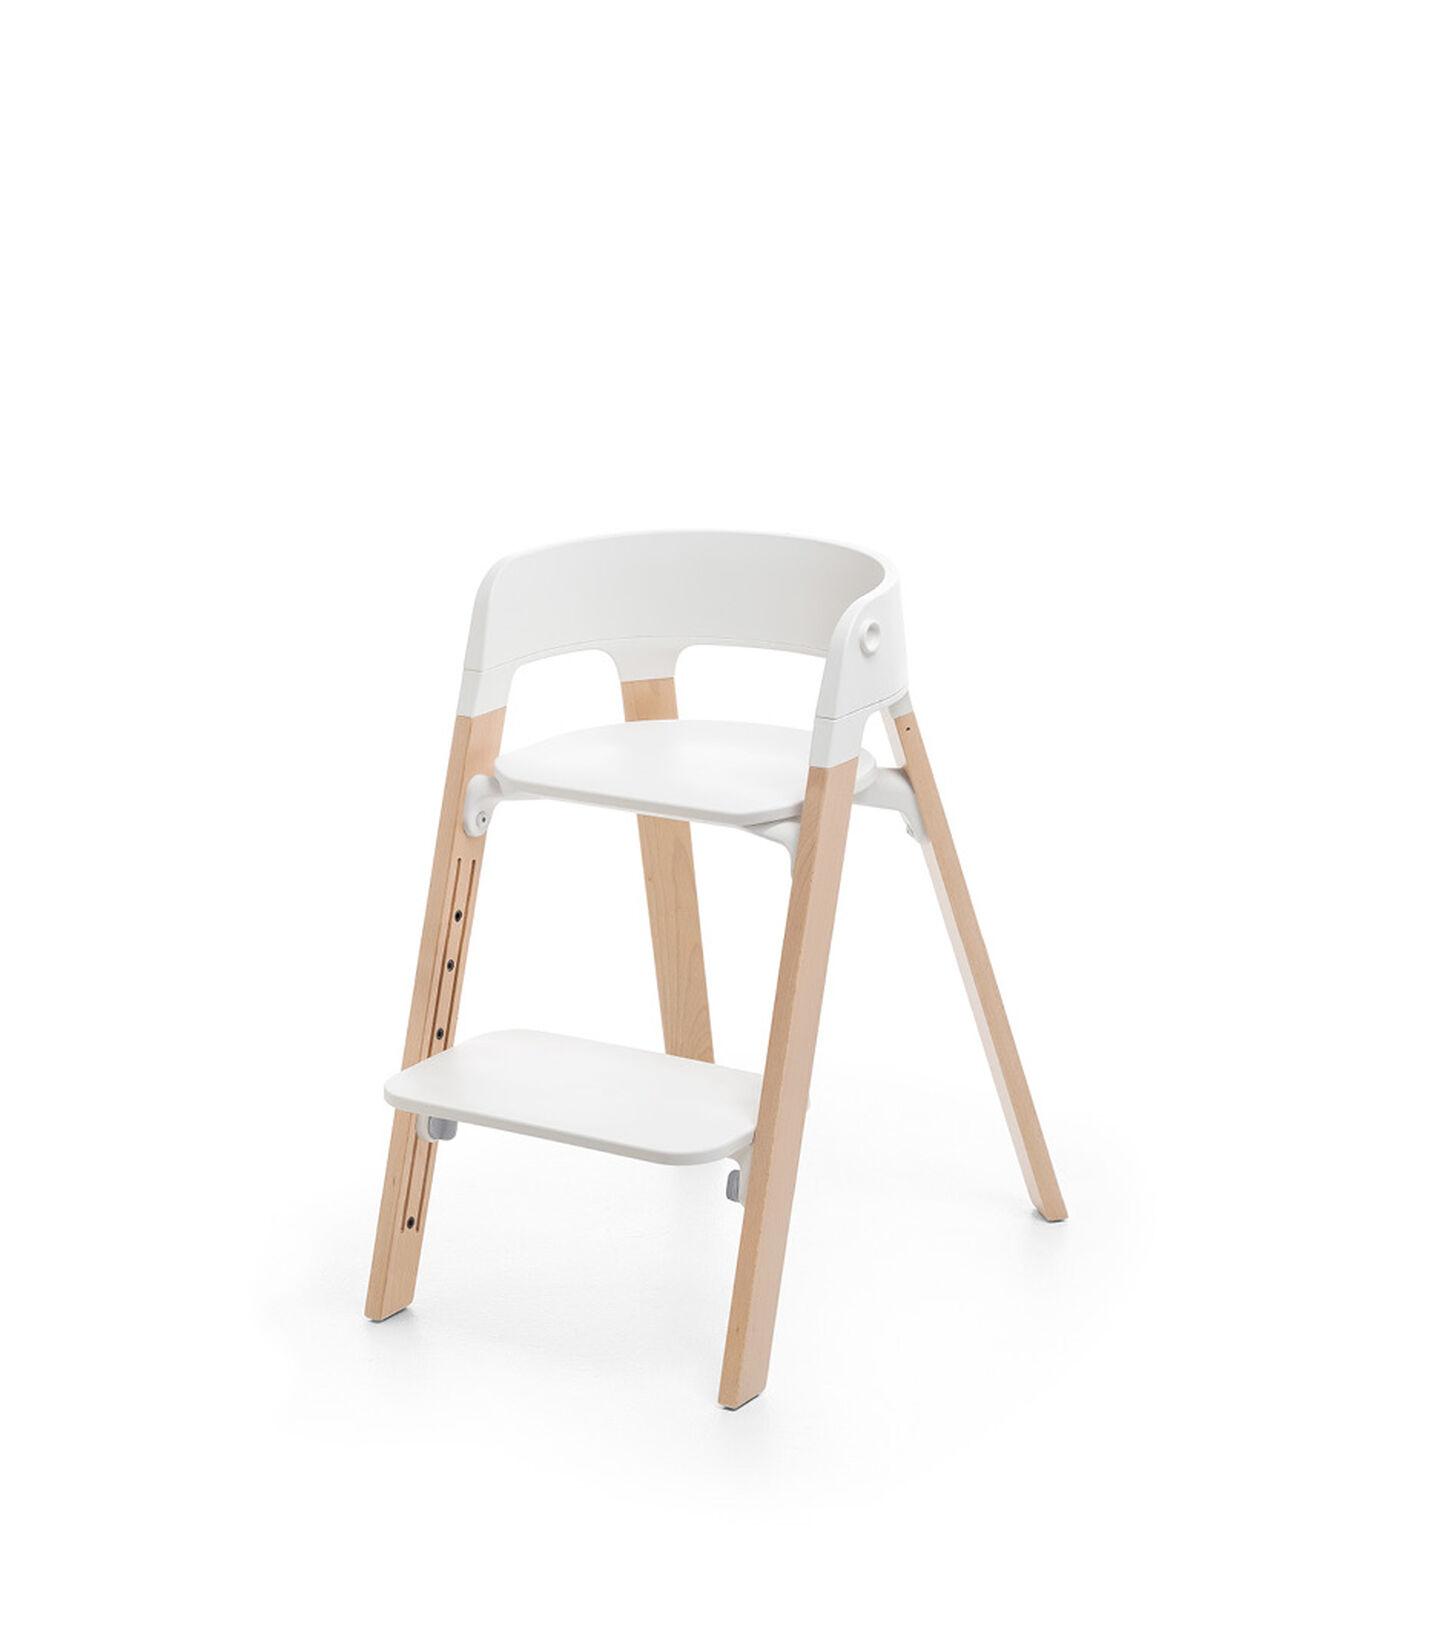 Stokke® Steps™ Stuhl Natur, White/Natural, mainview view 1